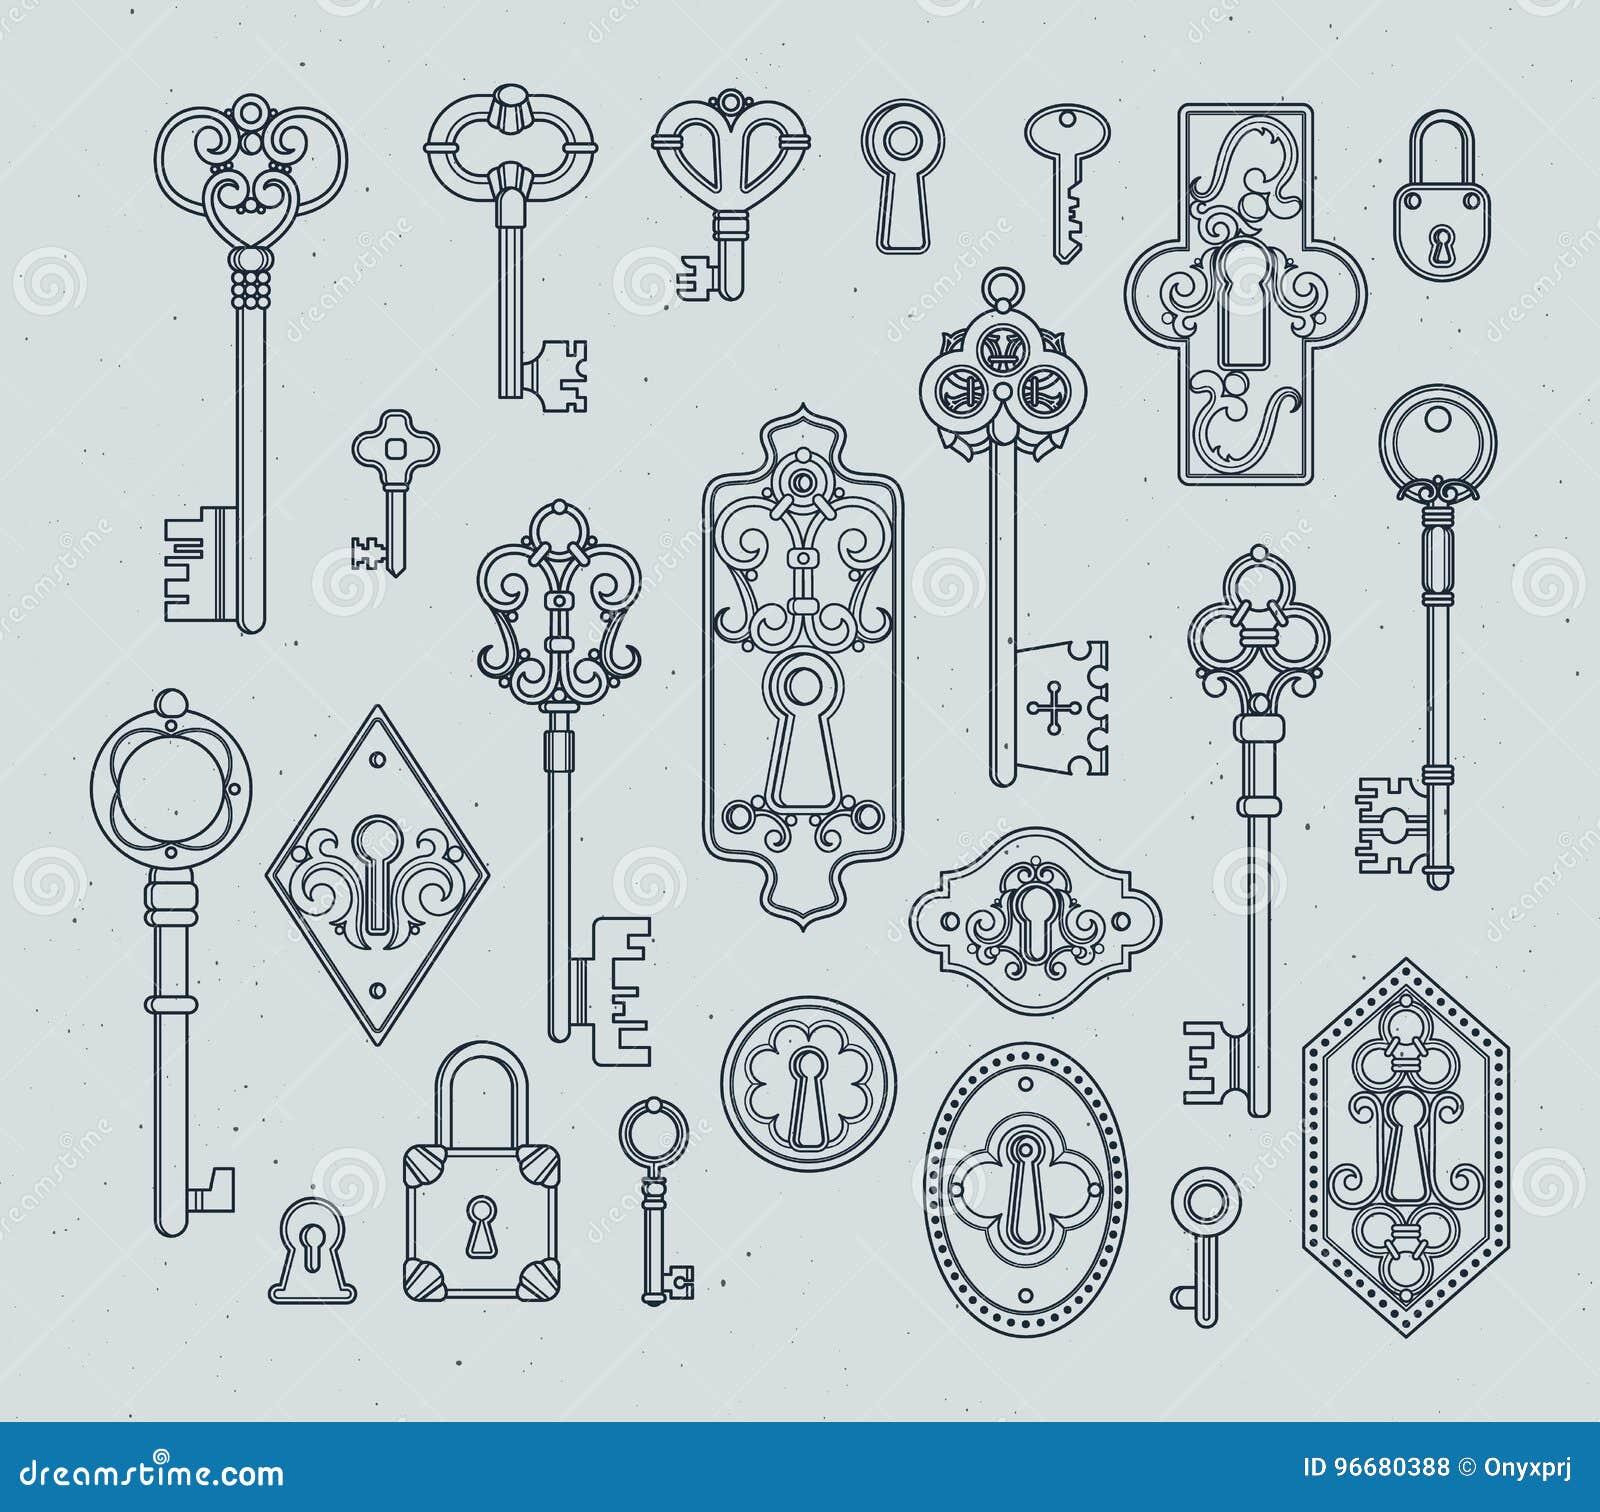 Vector Key Illustration: Vintage Keys And Padlocks For Medieval Doors. Hand Drawn